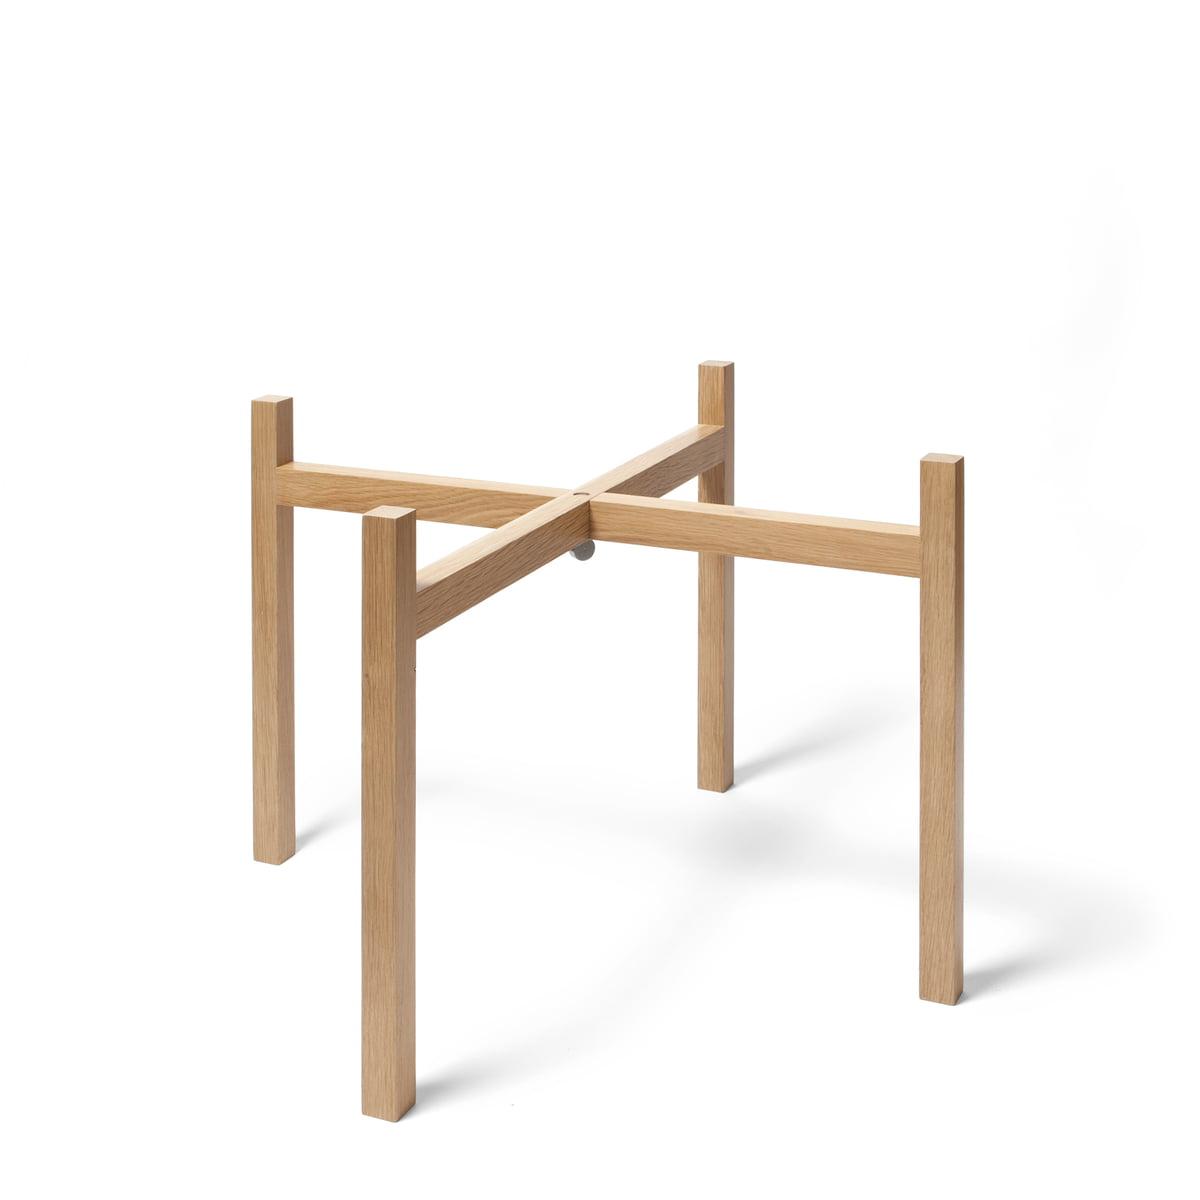 Tablo Side Table by Design House Stockholm